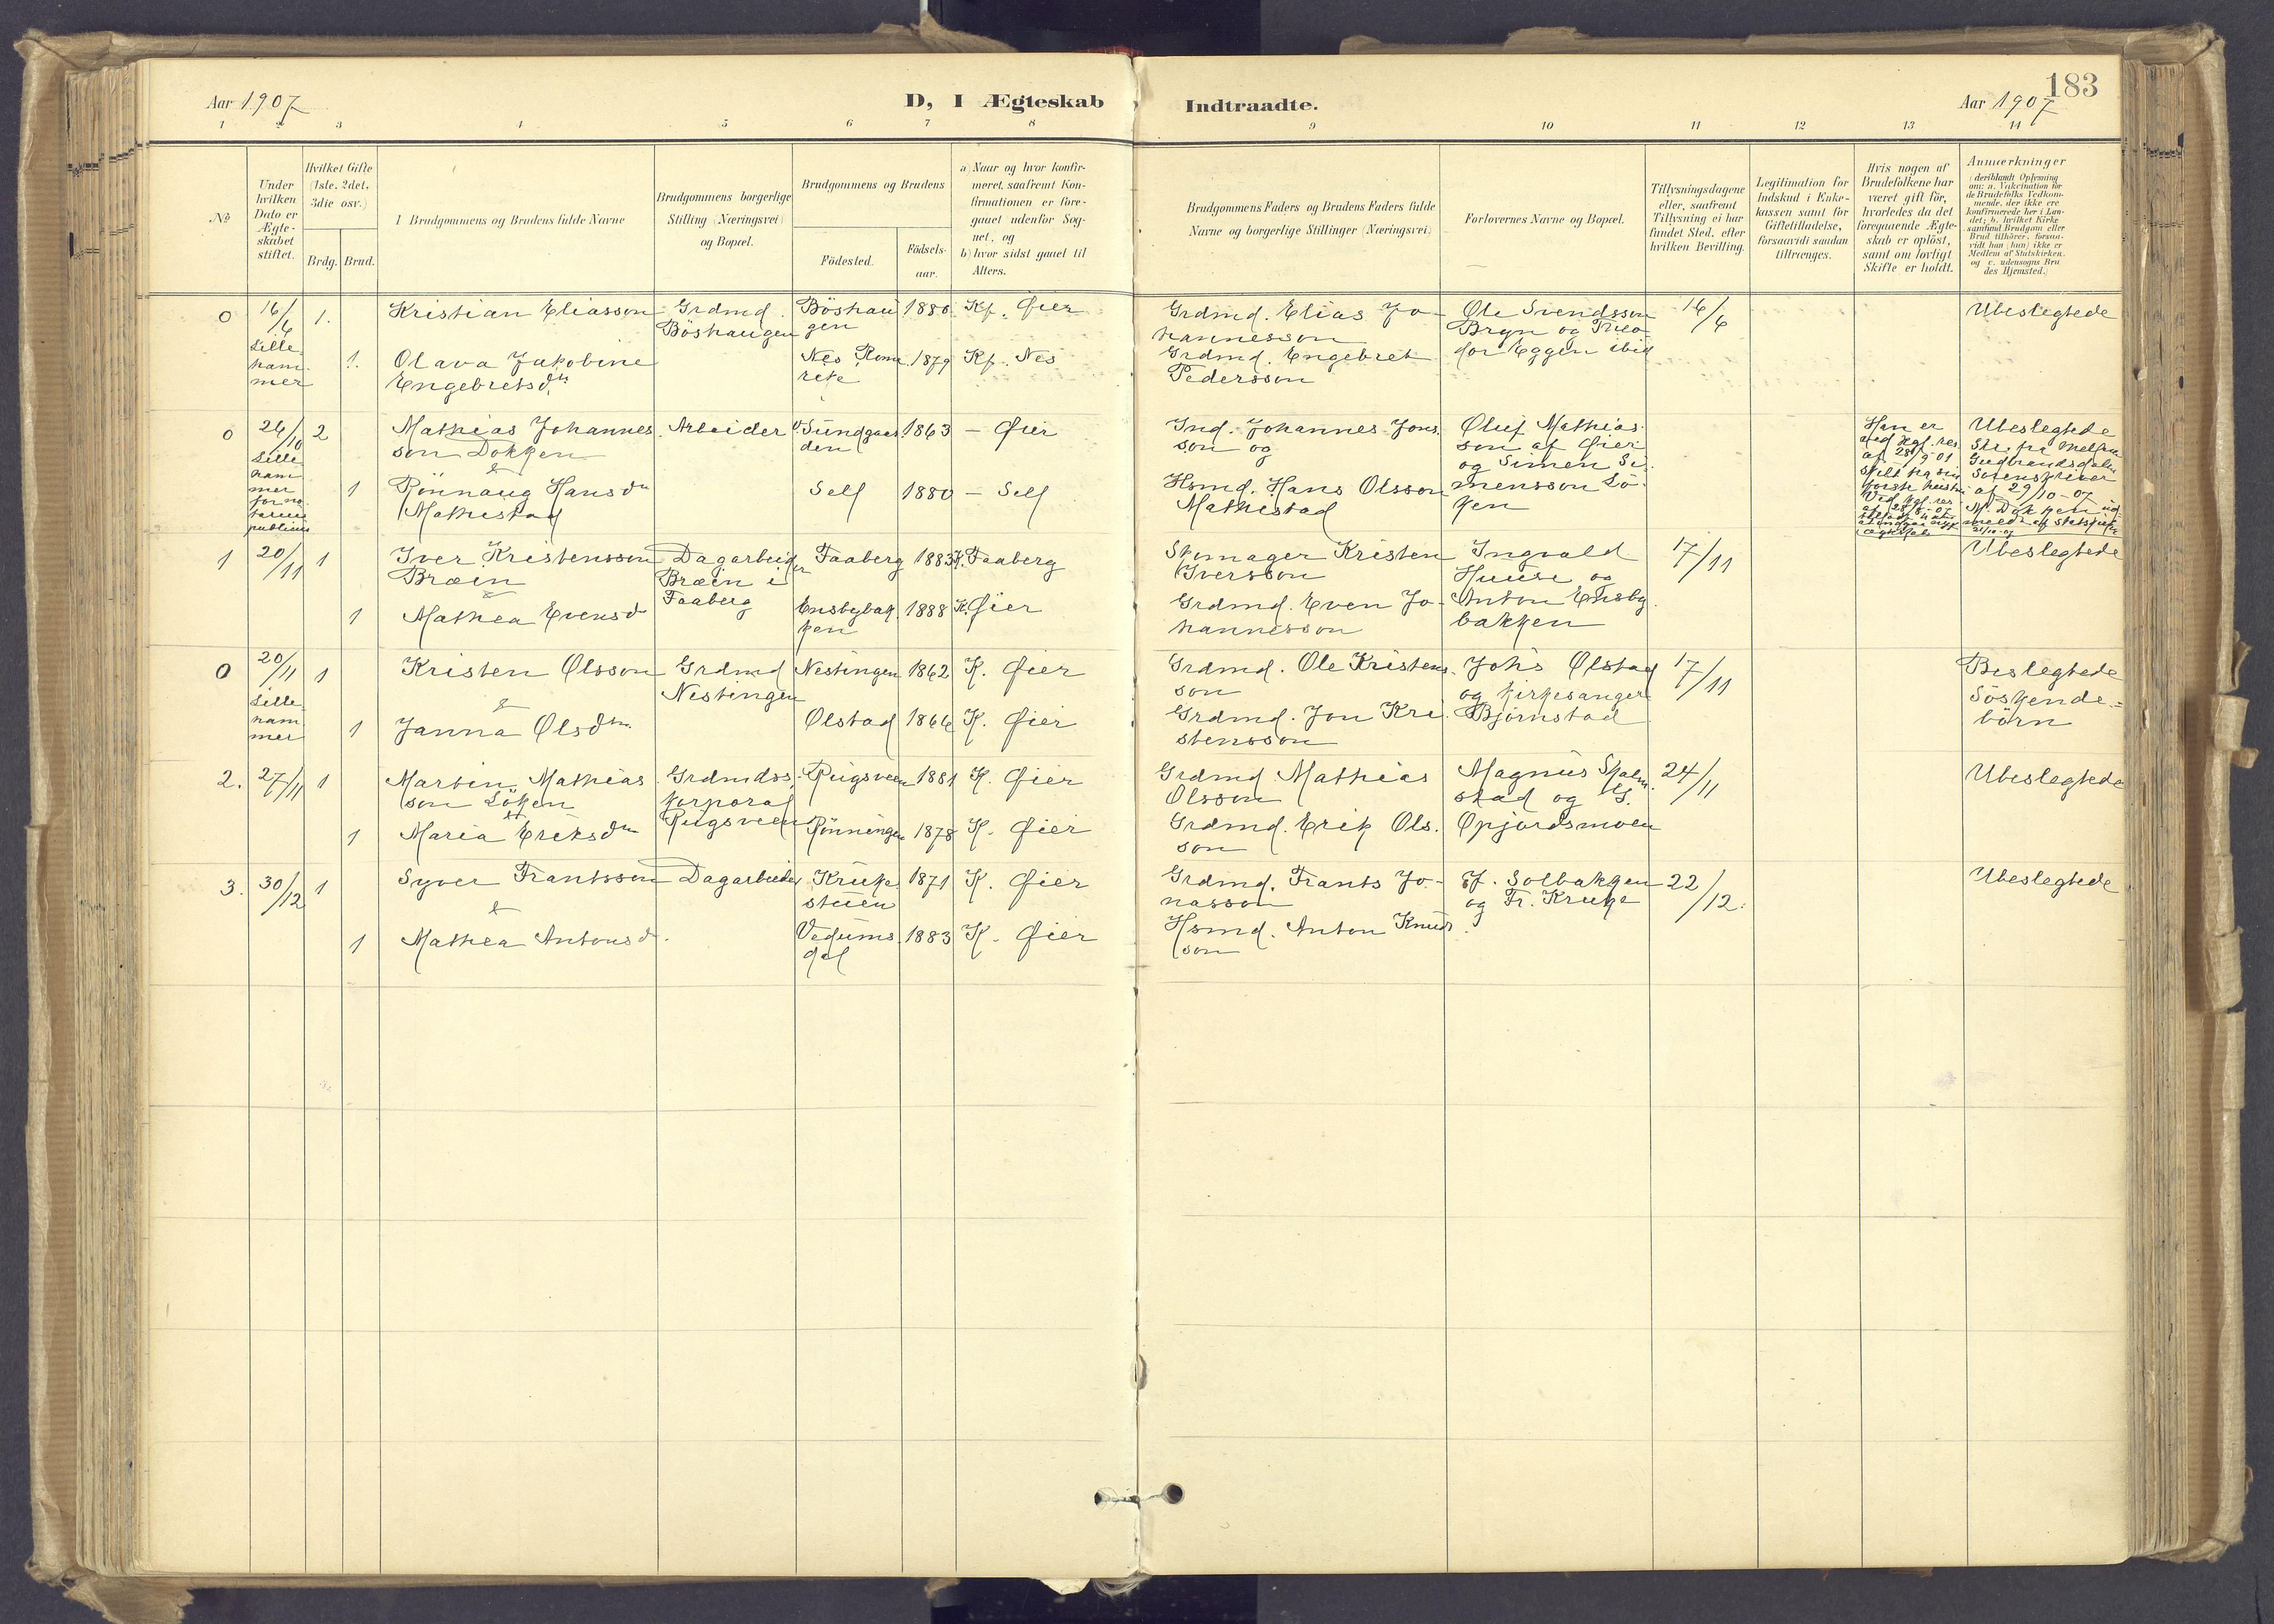 SAH, Øyer prestekontor, Ministerialbok nr. 12, 1897-1920, s. 183